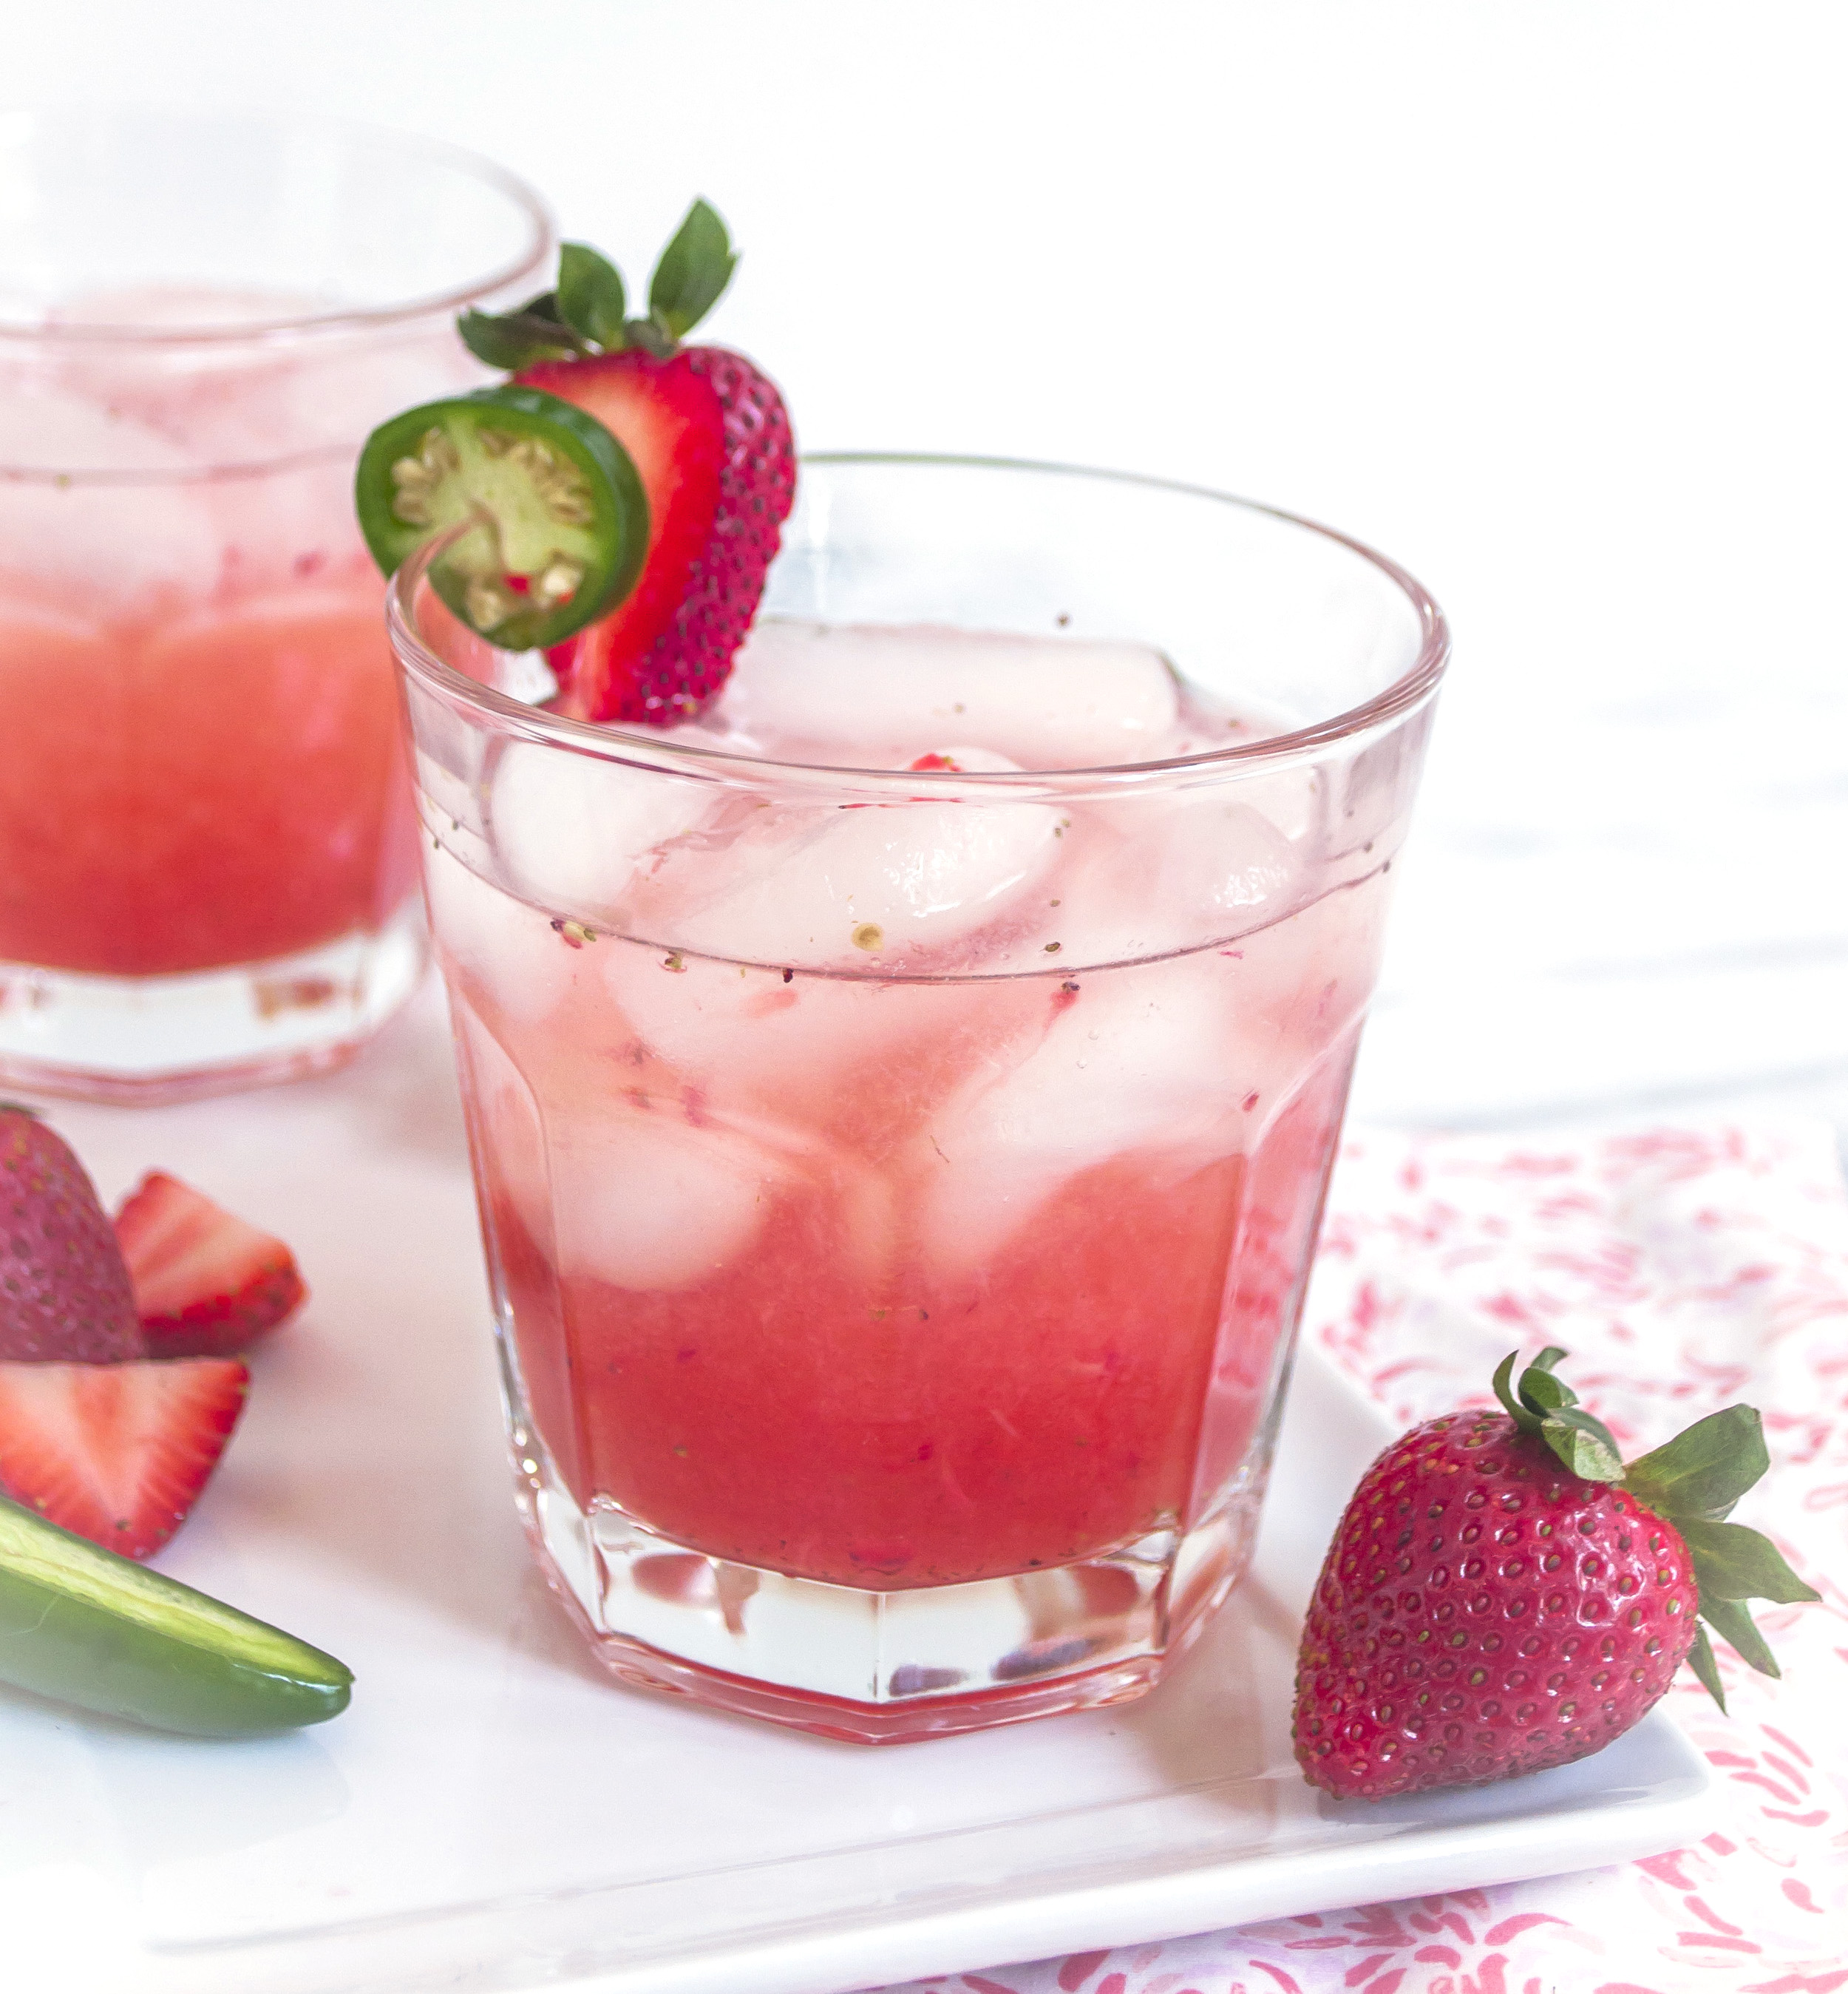 Spicy Strawberry Jalapeno Daiquiris with Cruzan Rum Strawberry